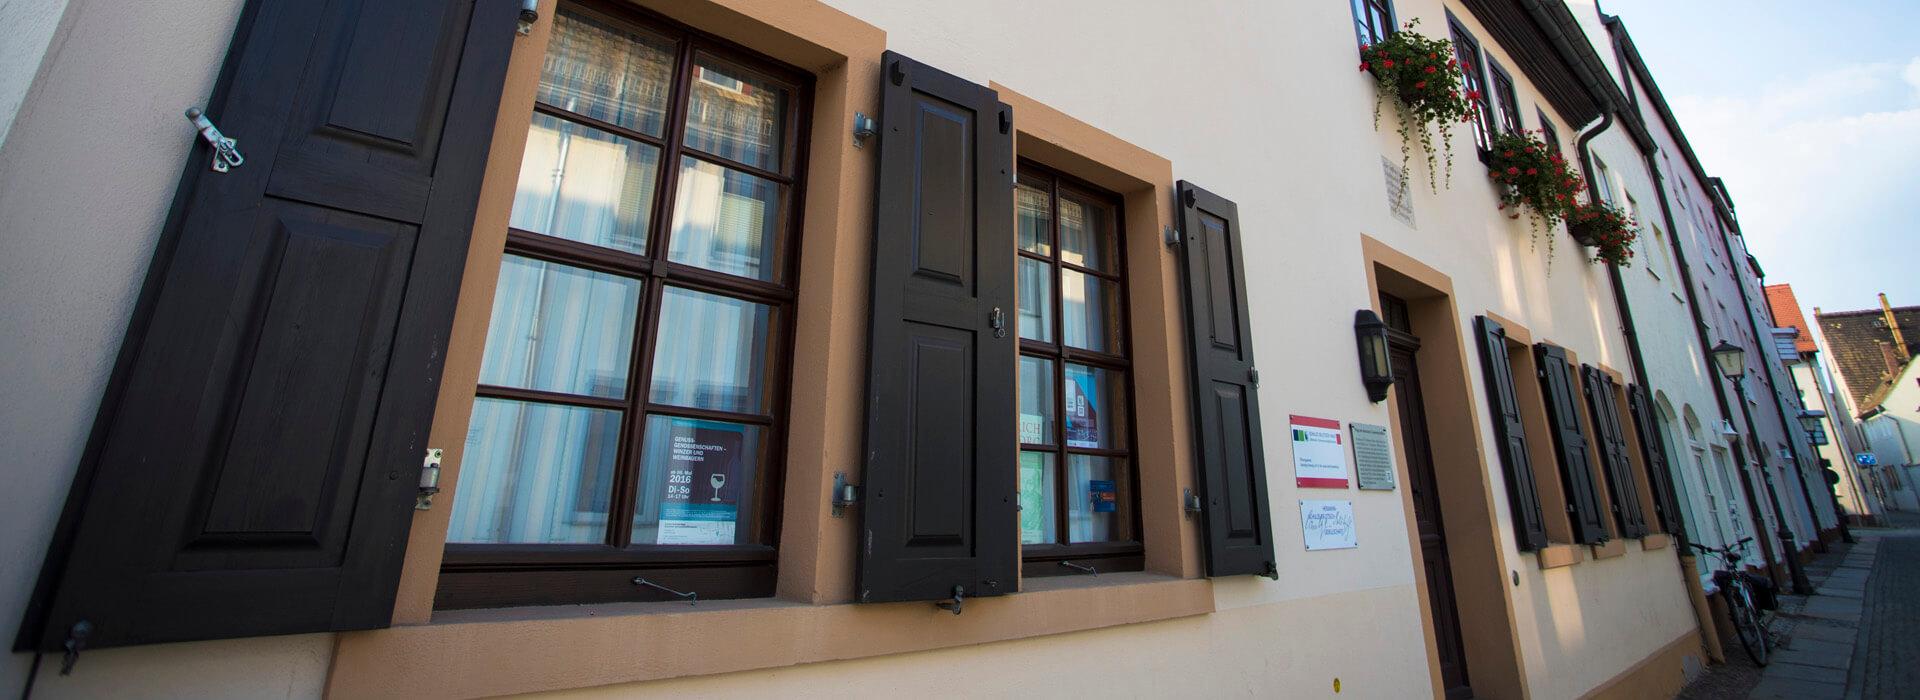 Schulze-Delitzsch-Haus